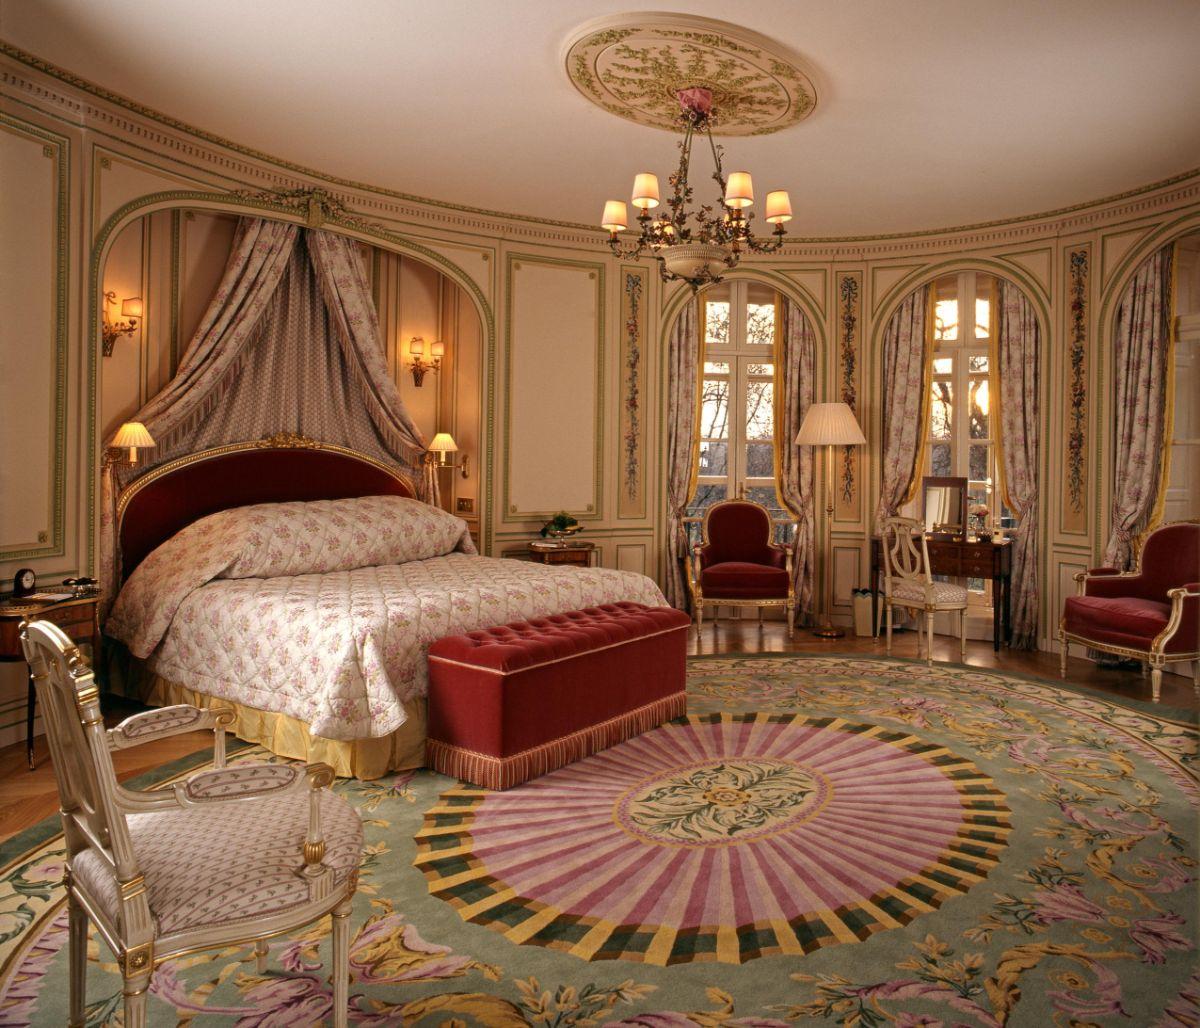 дизайн спальни в стиле модерн балдахин